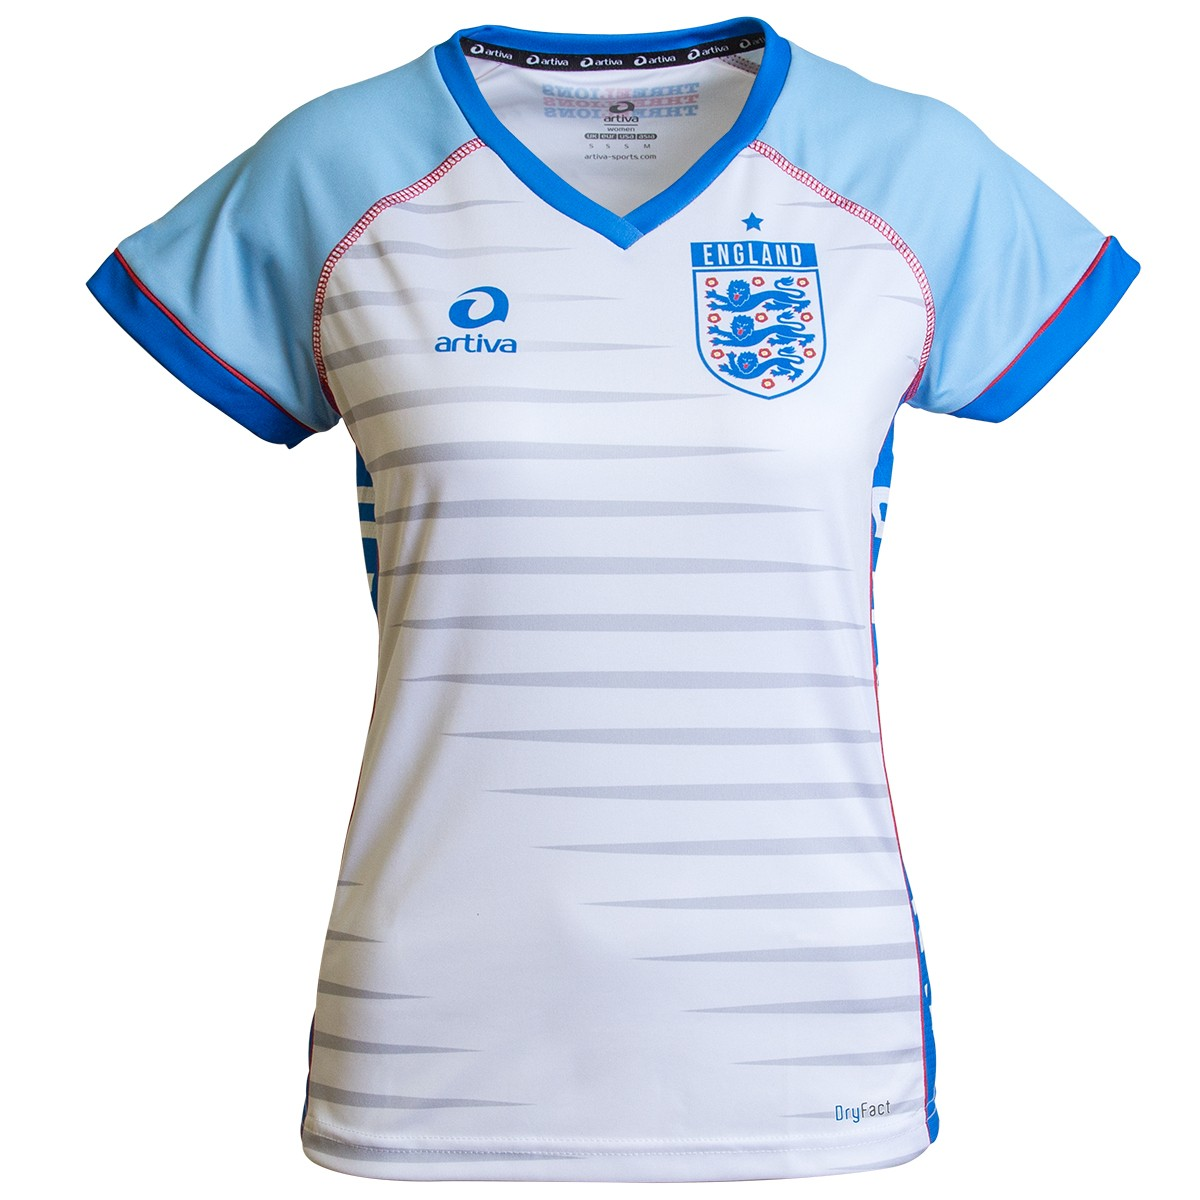 England Trikot. Fan Trikot England für Olympia und WM 2018